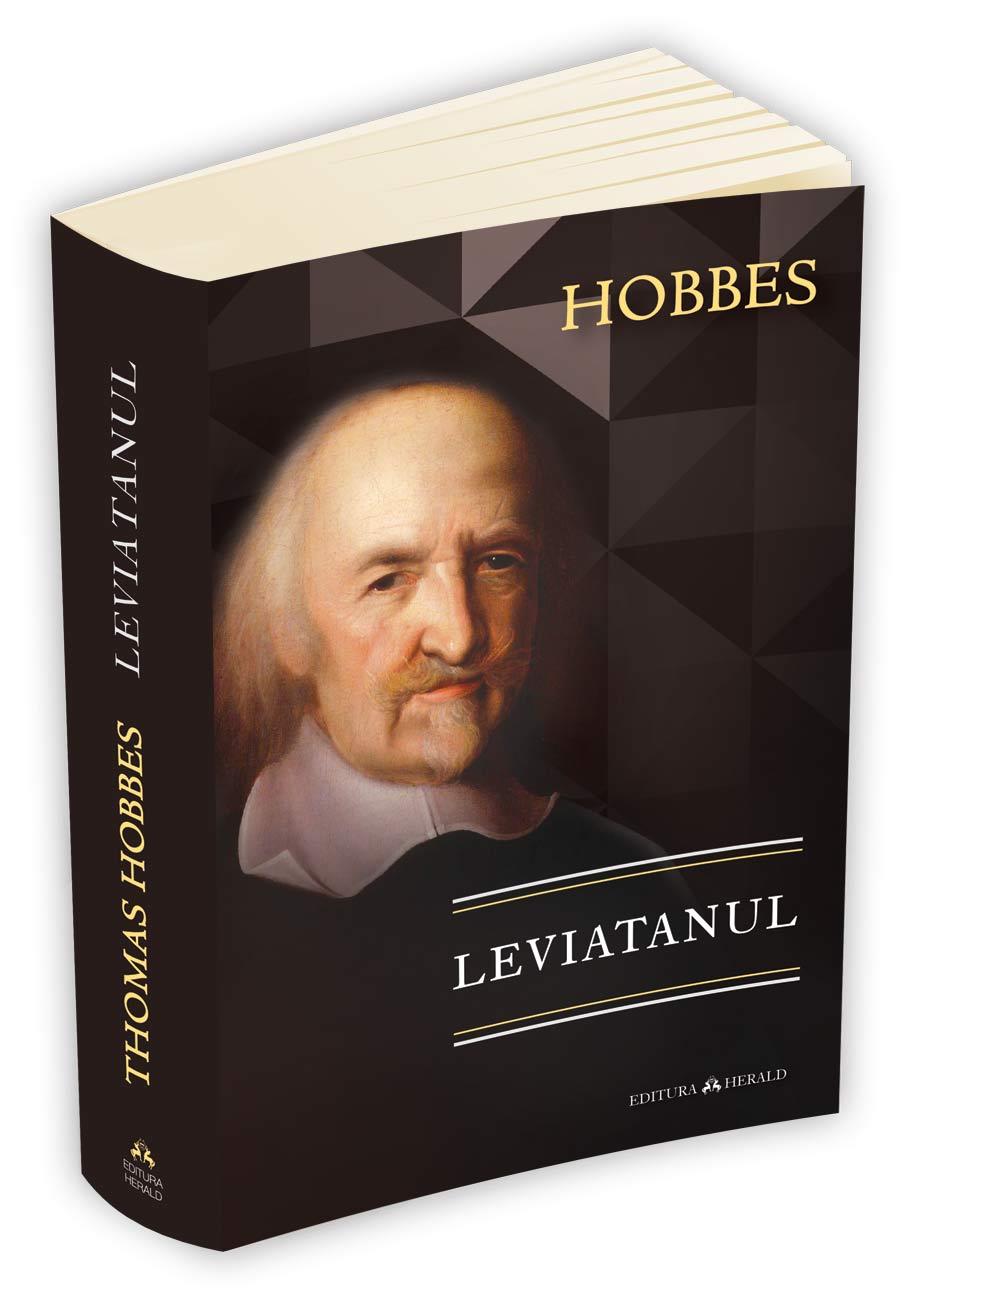 Leviatanul | Thomas Hobbes